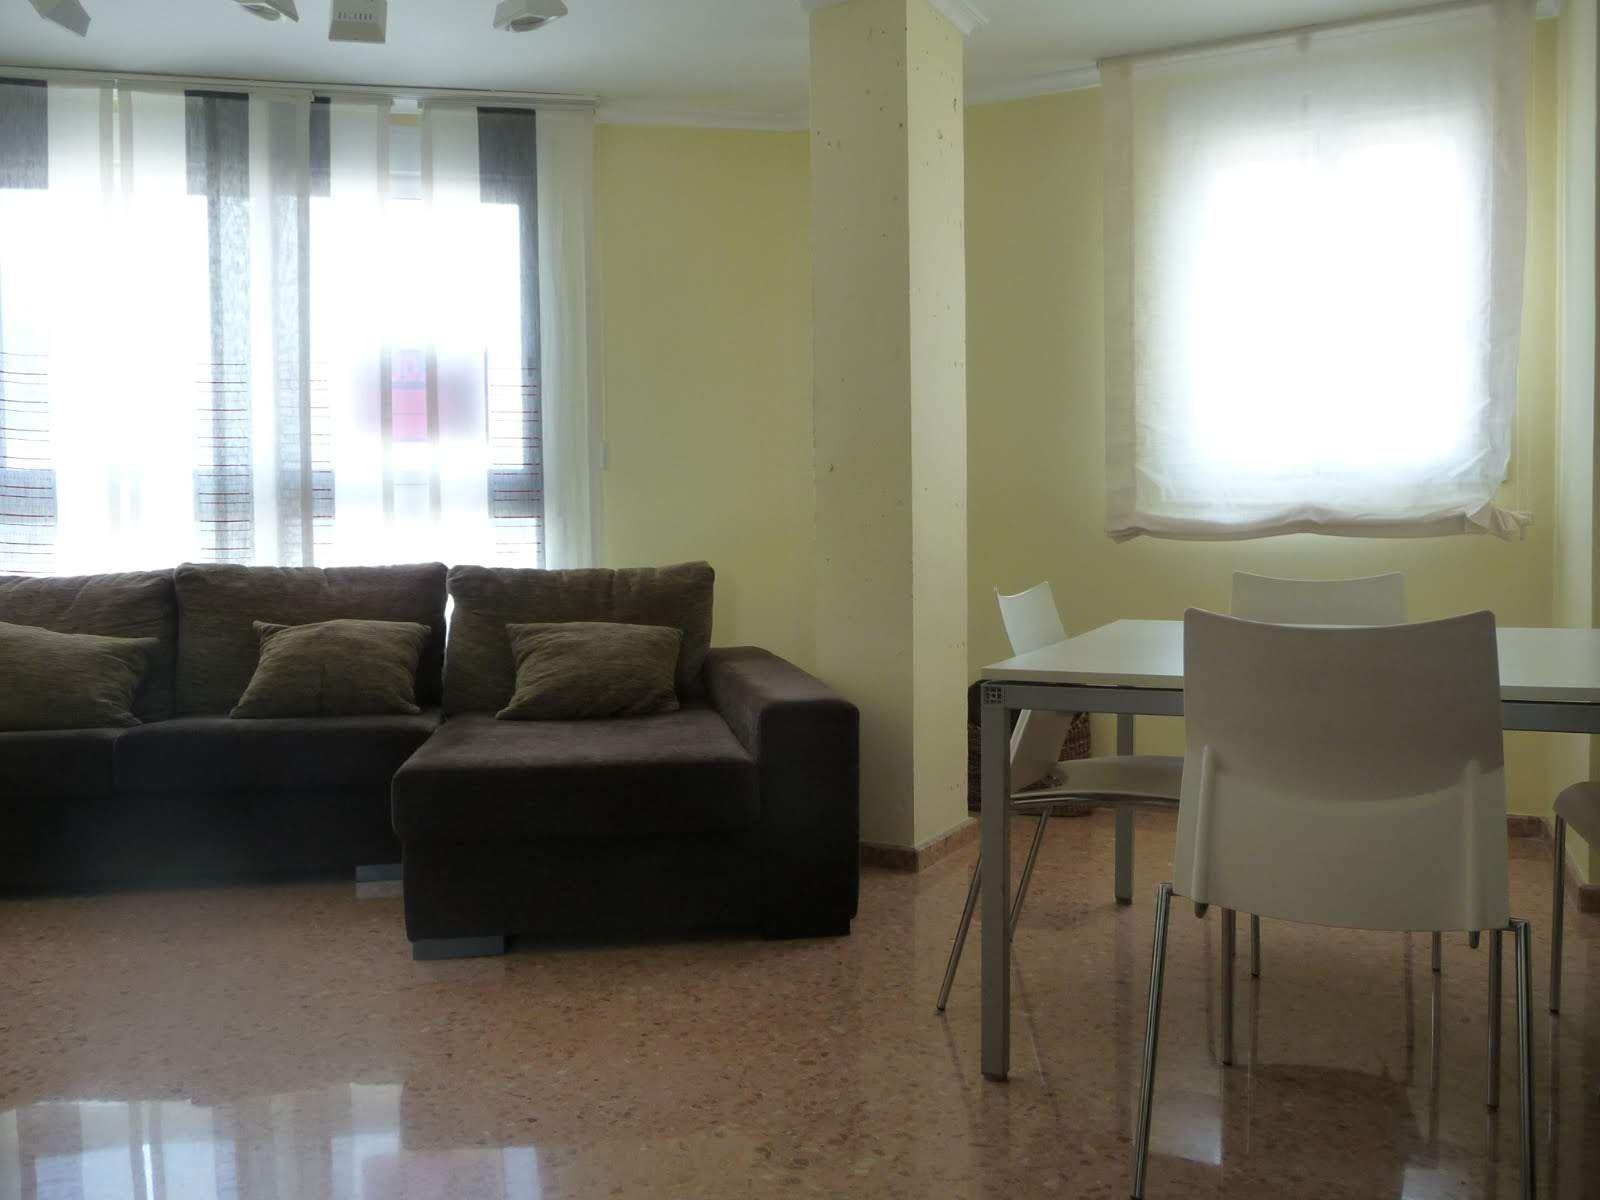 Miete Wohnung In Benaguasil